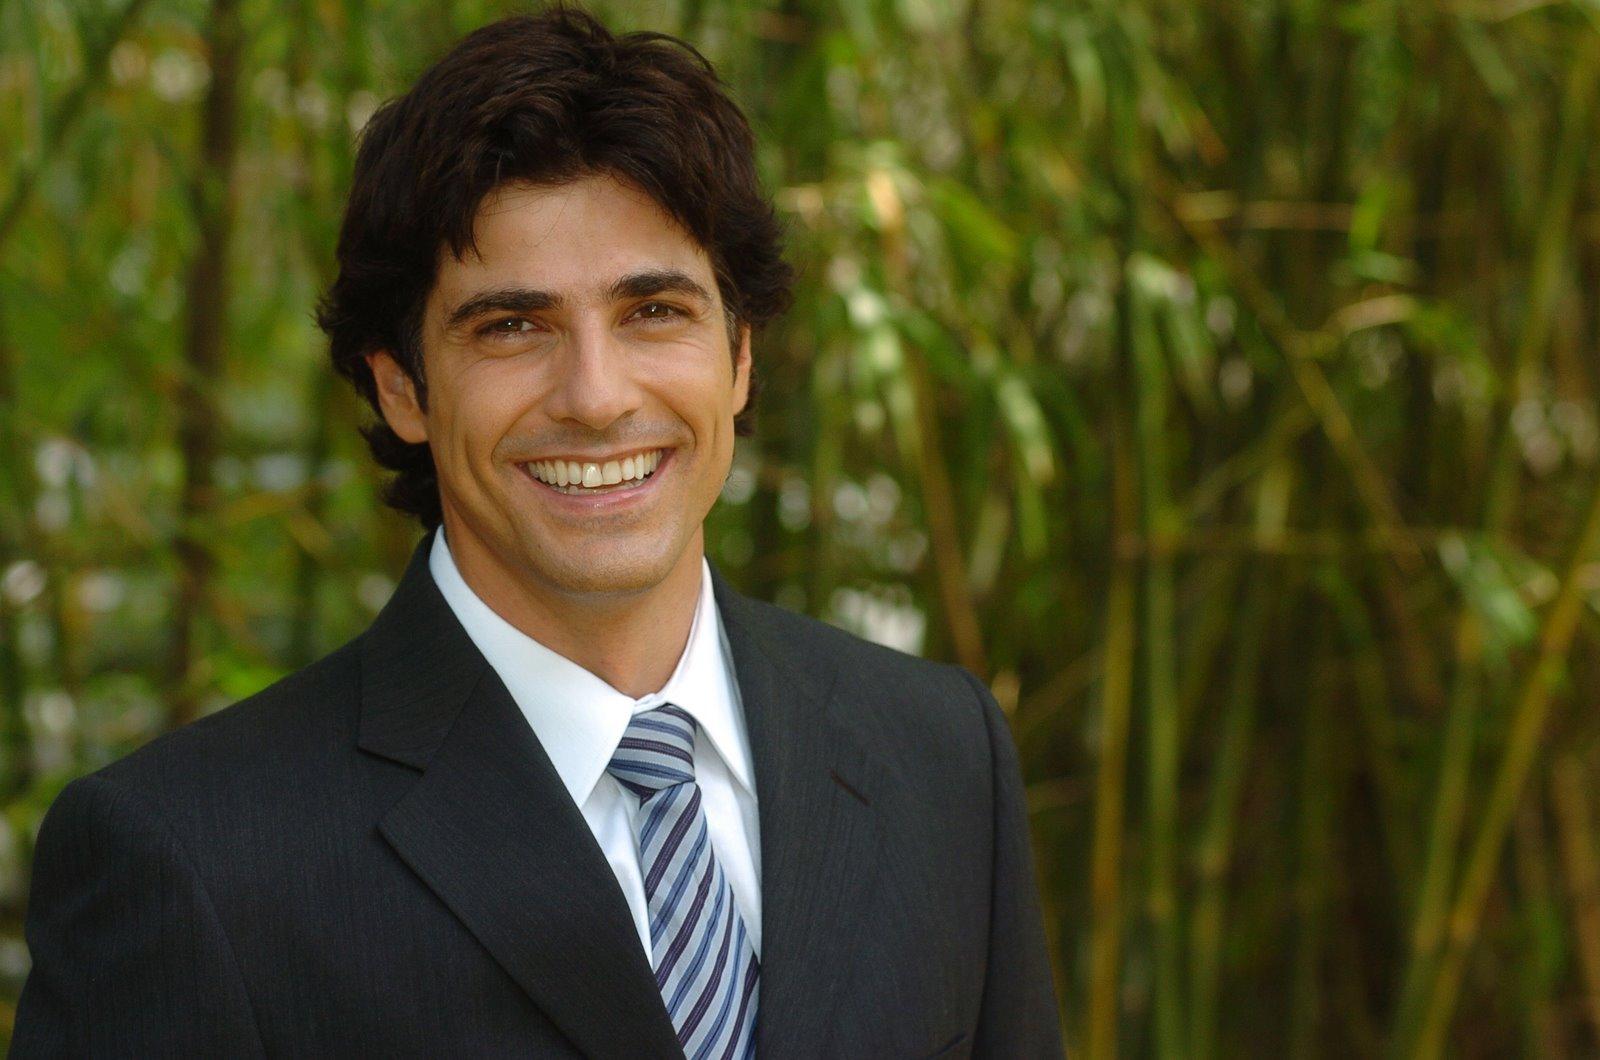 Reynaldo Gianecchini Backgrounds